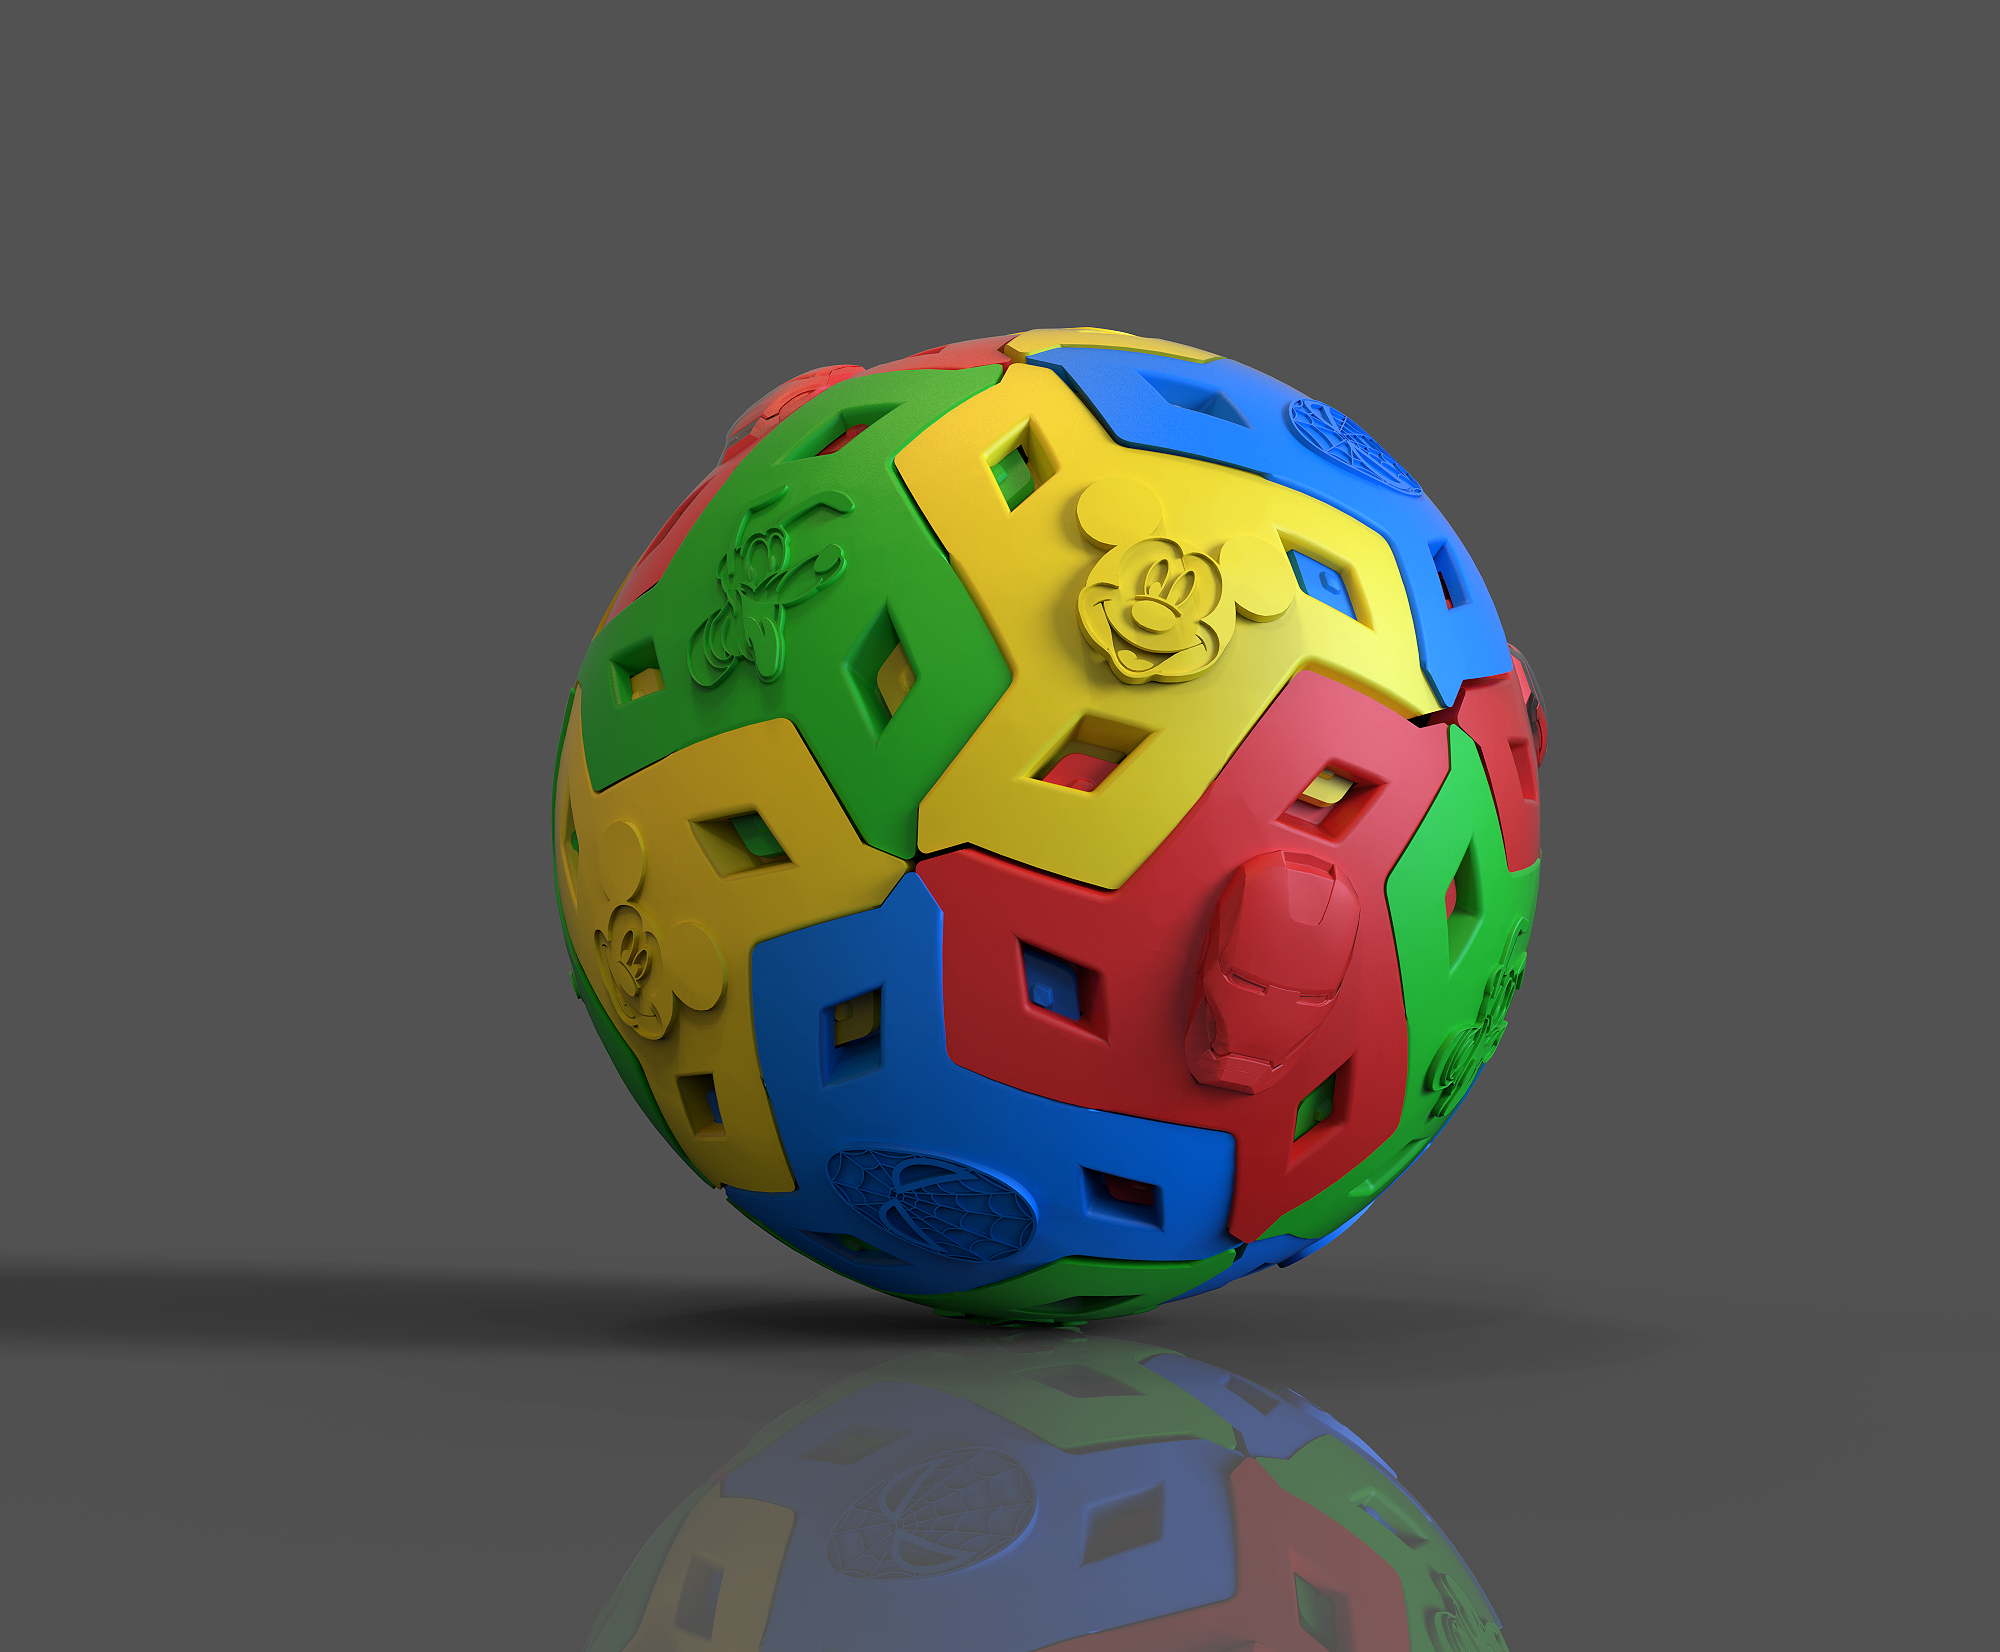 BallReflective